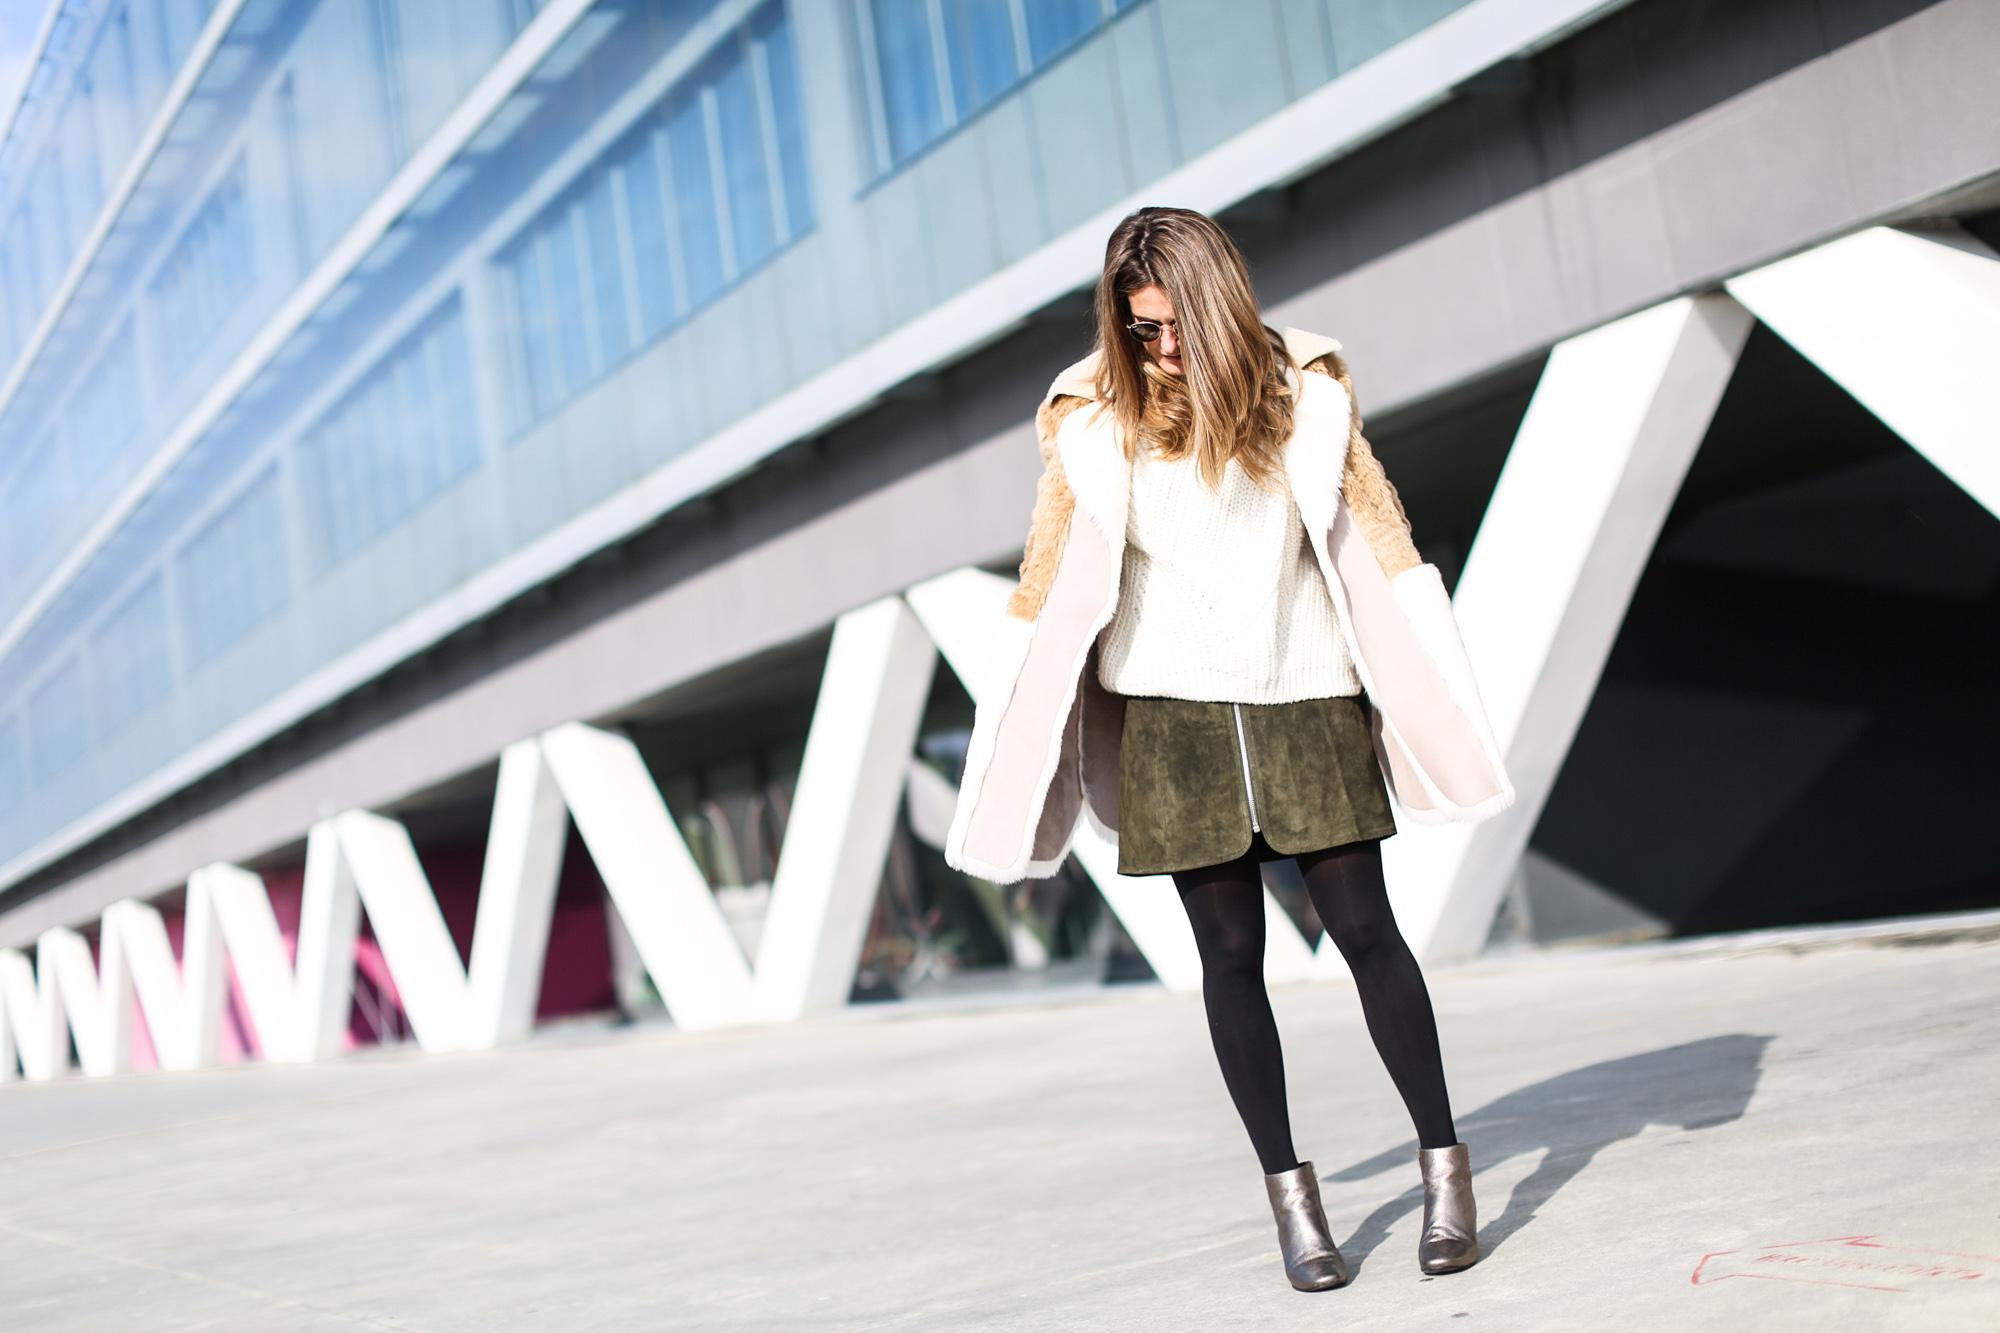 Clochet_streetstyle_fashionblogger_asosfauxfurcoat_minifaldaantezara_botinespieldorados